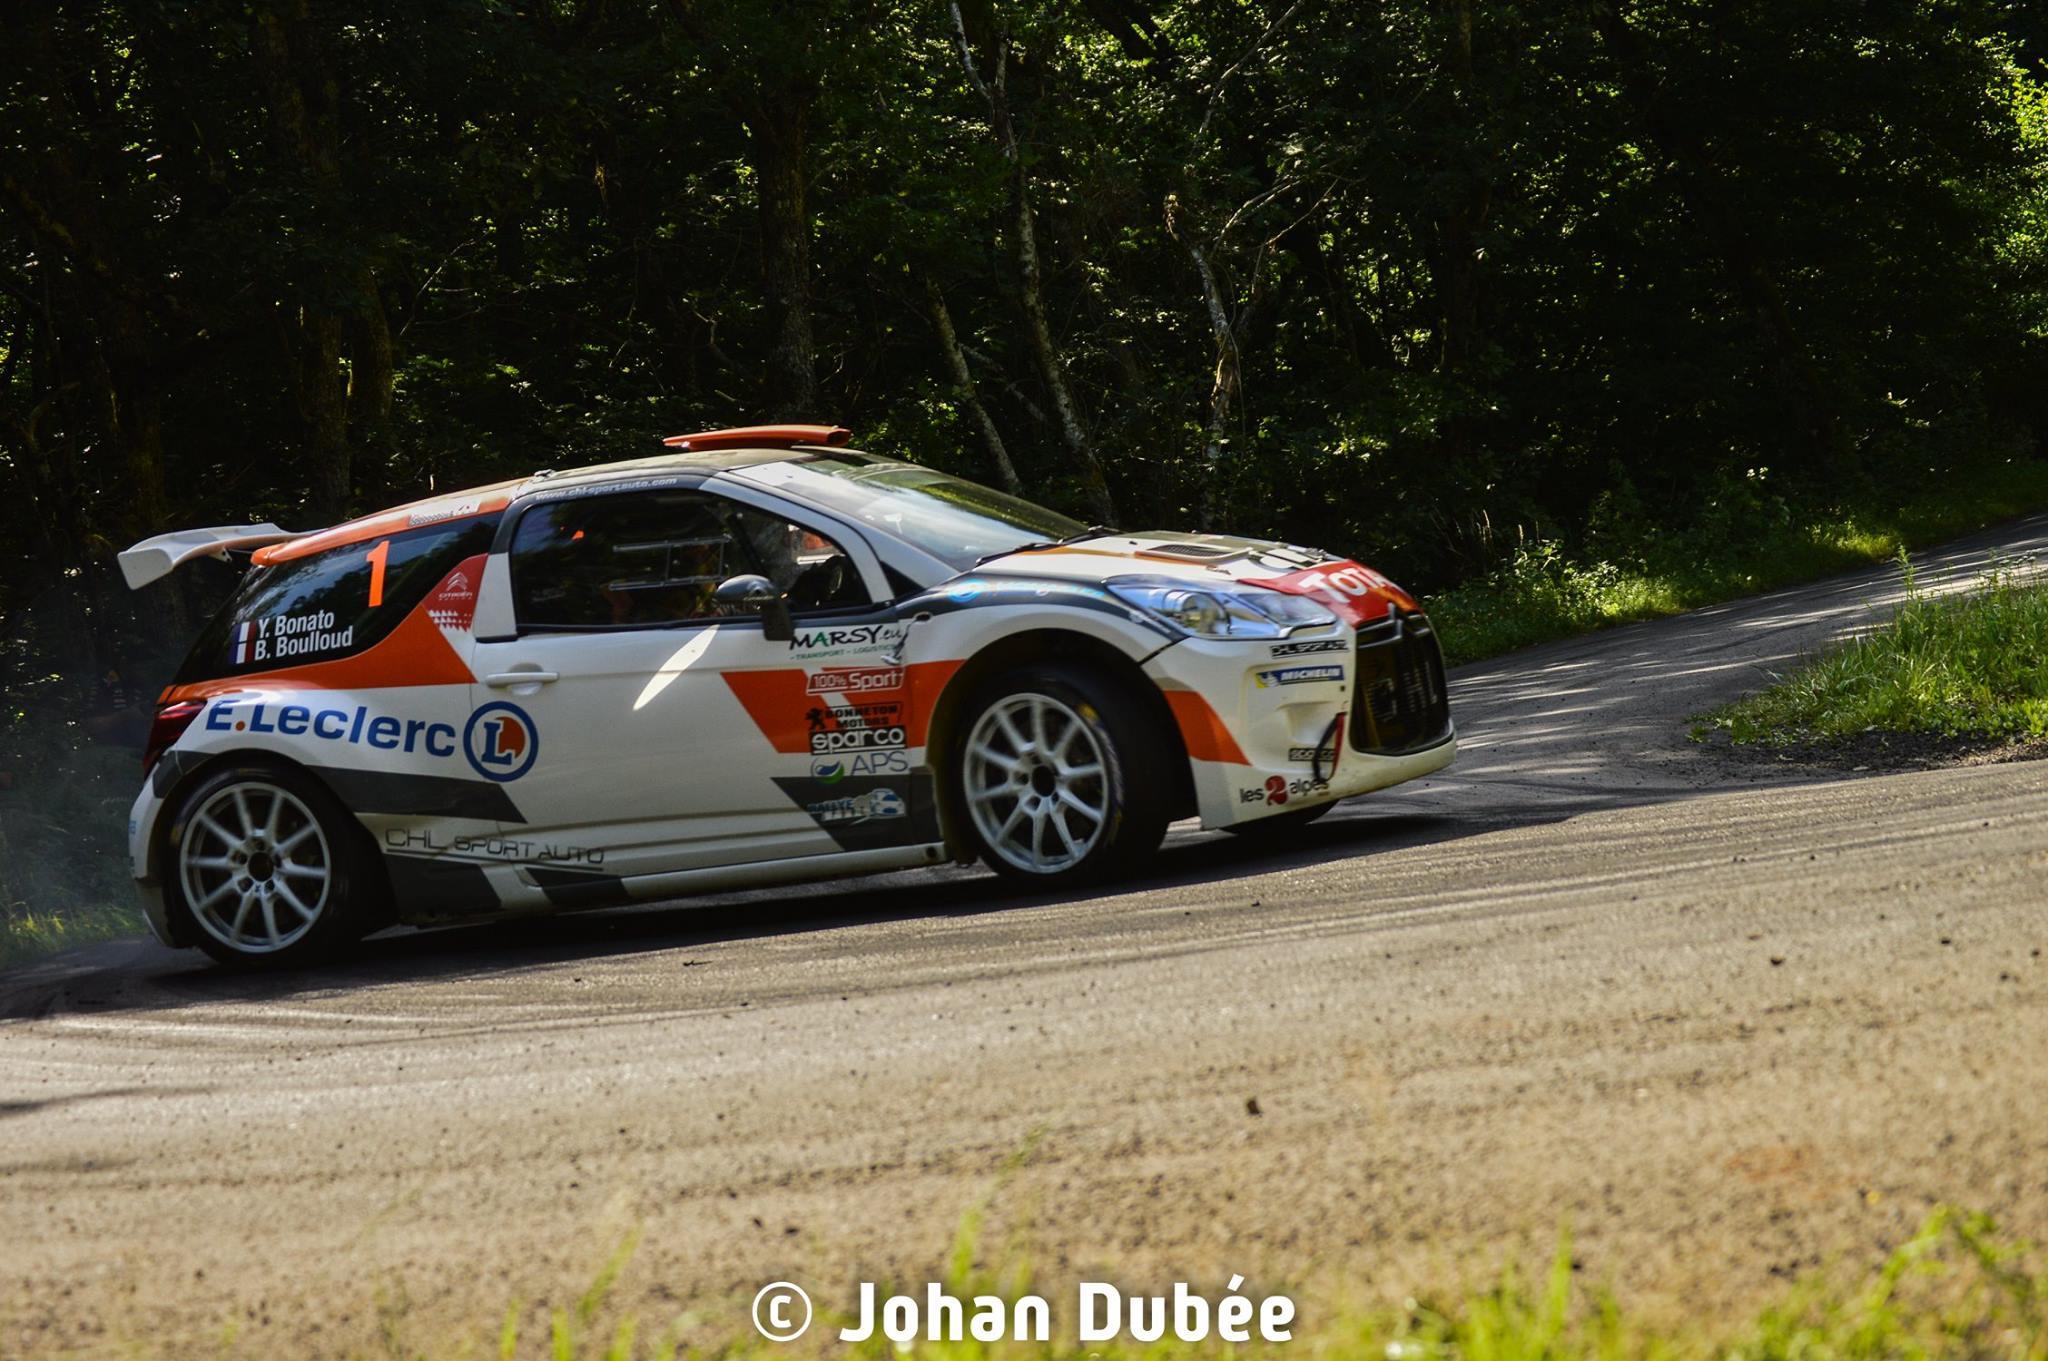 Bonato Rallye du Rouergue 2017